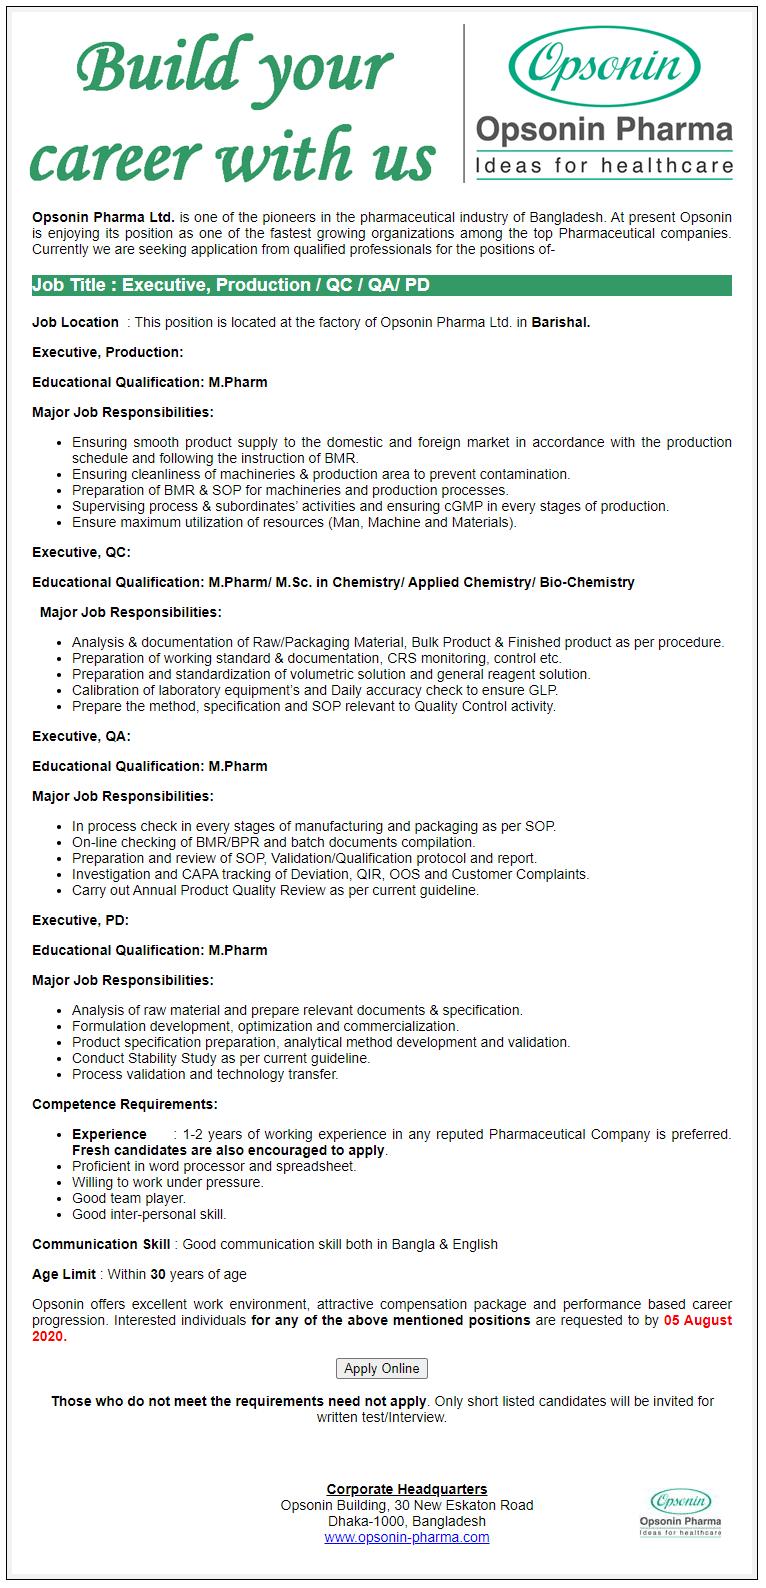 Opsonin Pharma Limited Job Circular 2020